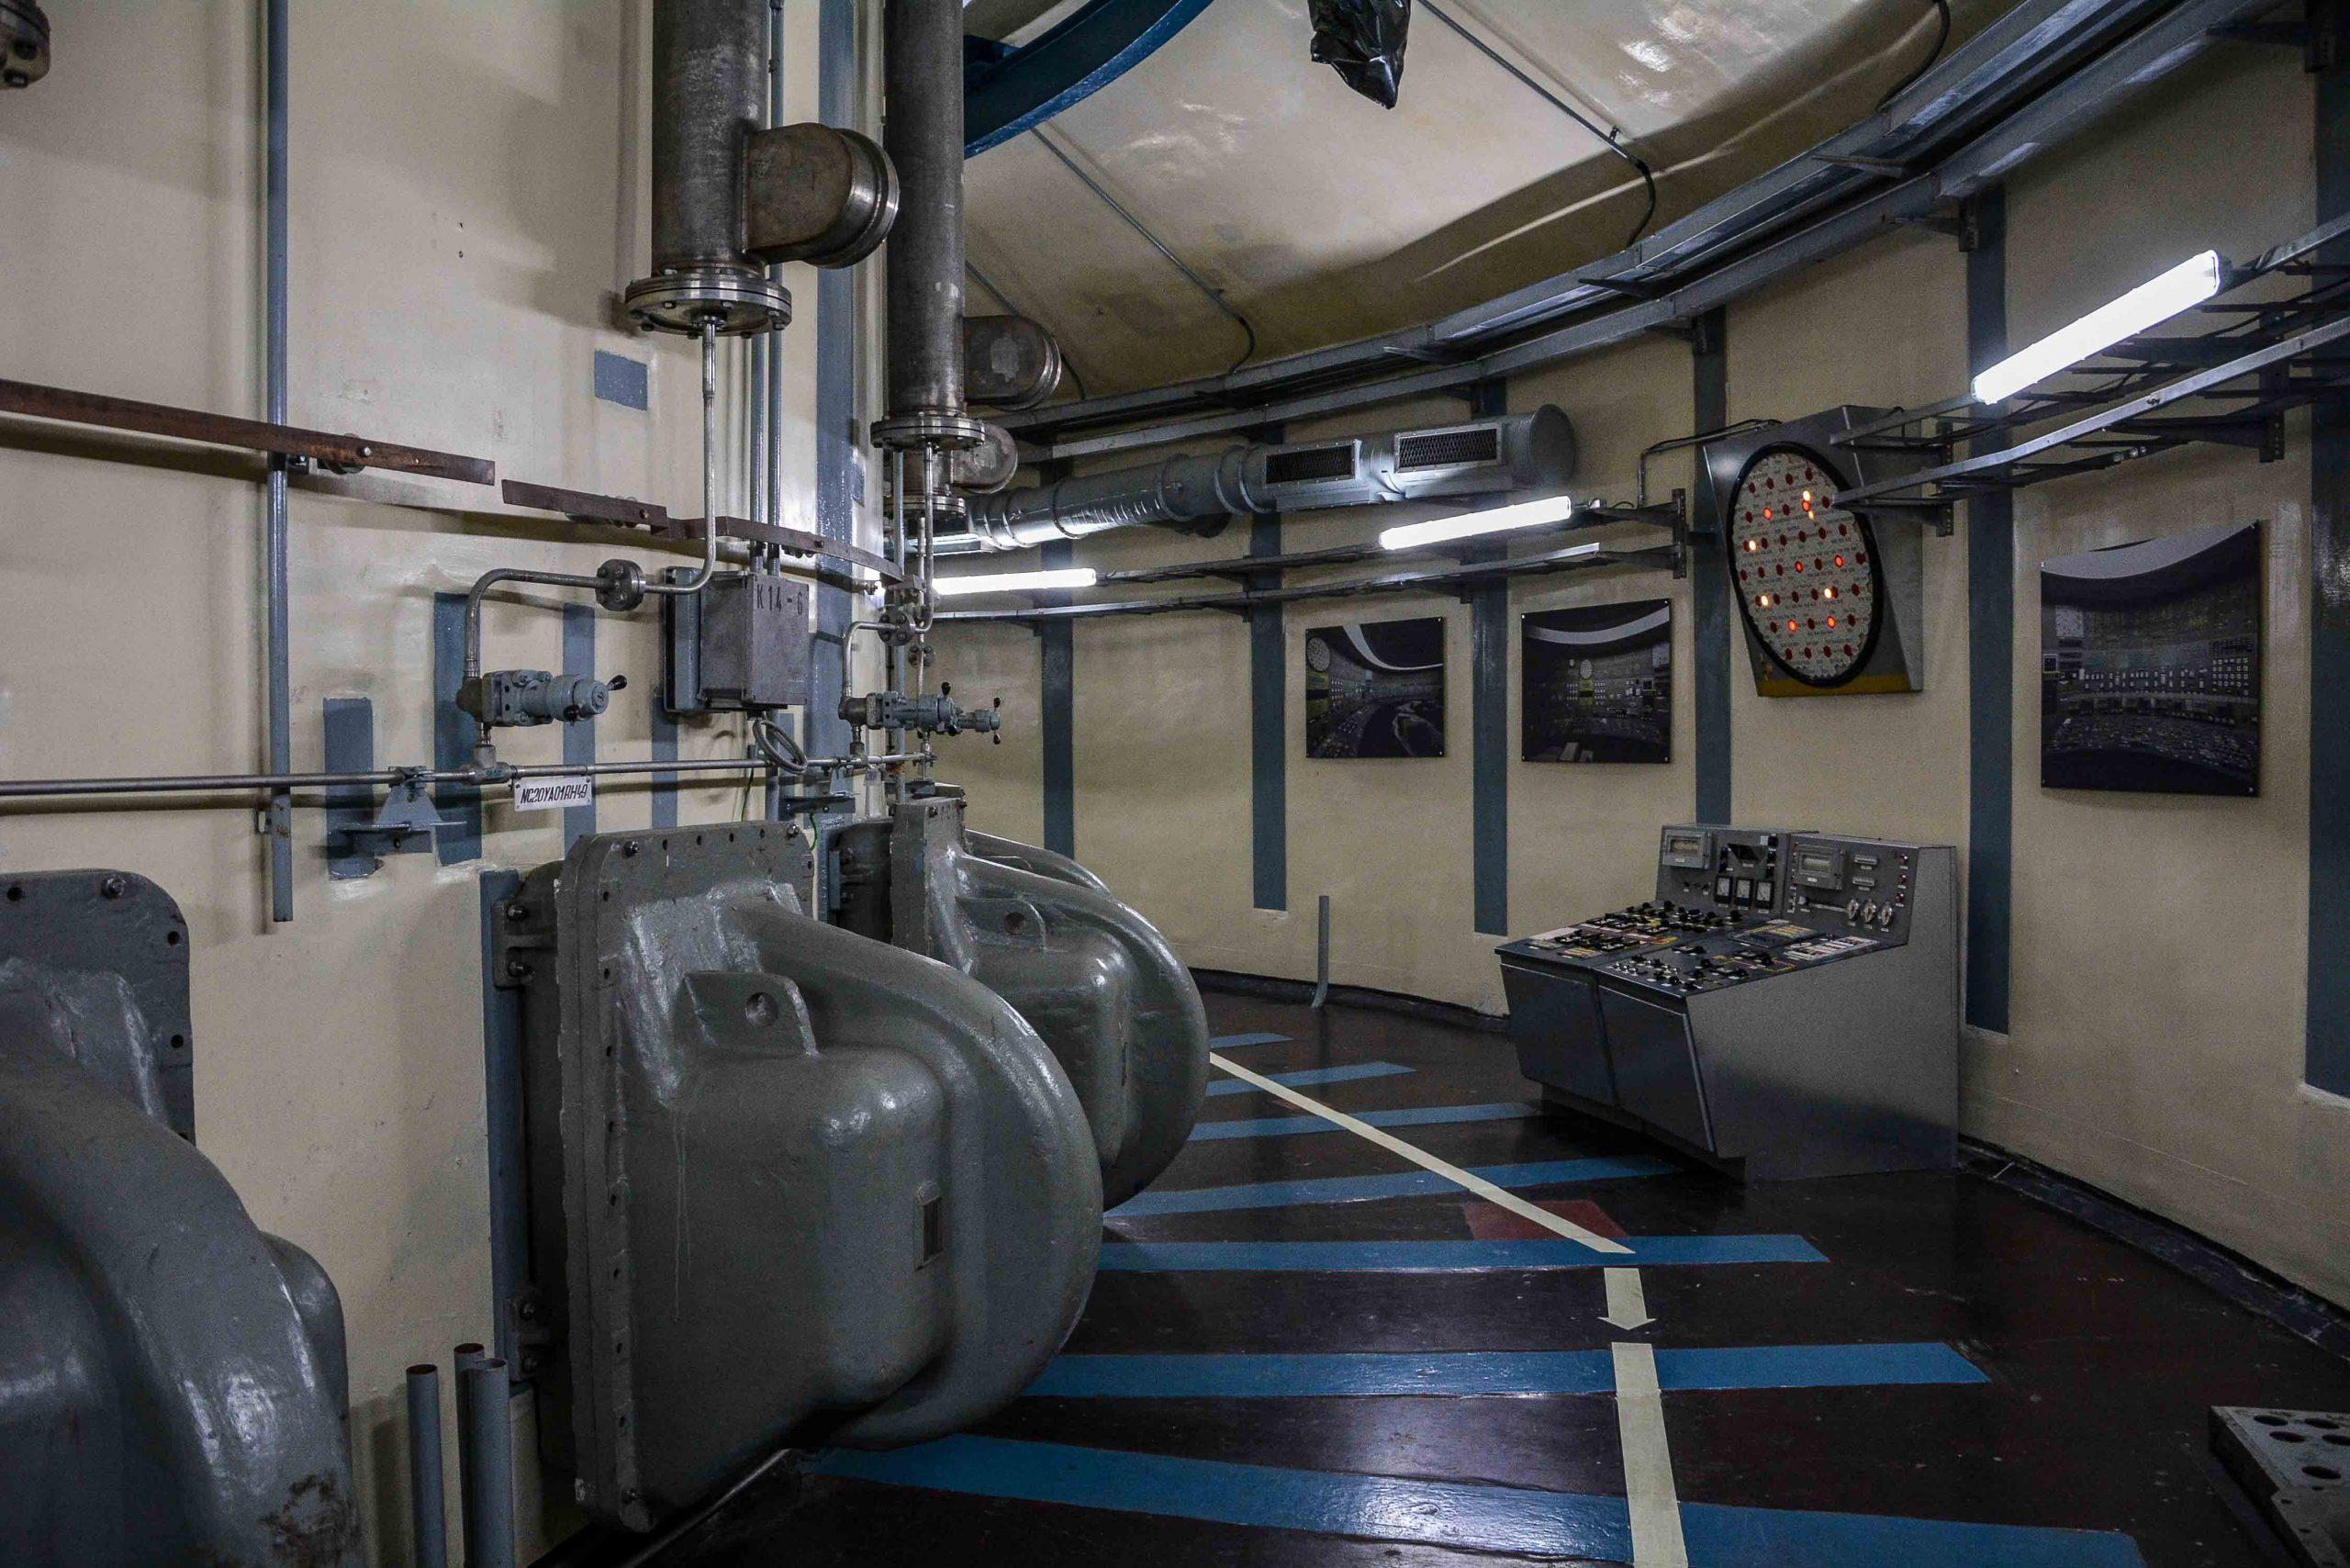 reaktor pult gang kernkraftwerk greifswald nuclear powerplant ost deutschland east germany gdr DDR mecklenburg vorpommern